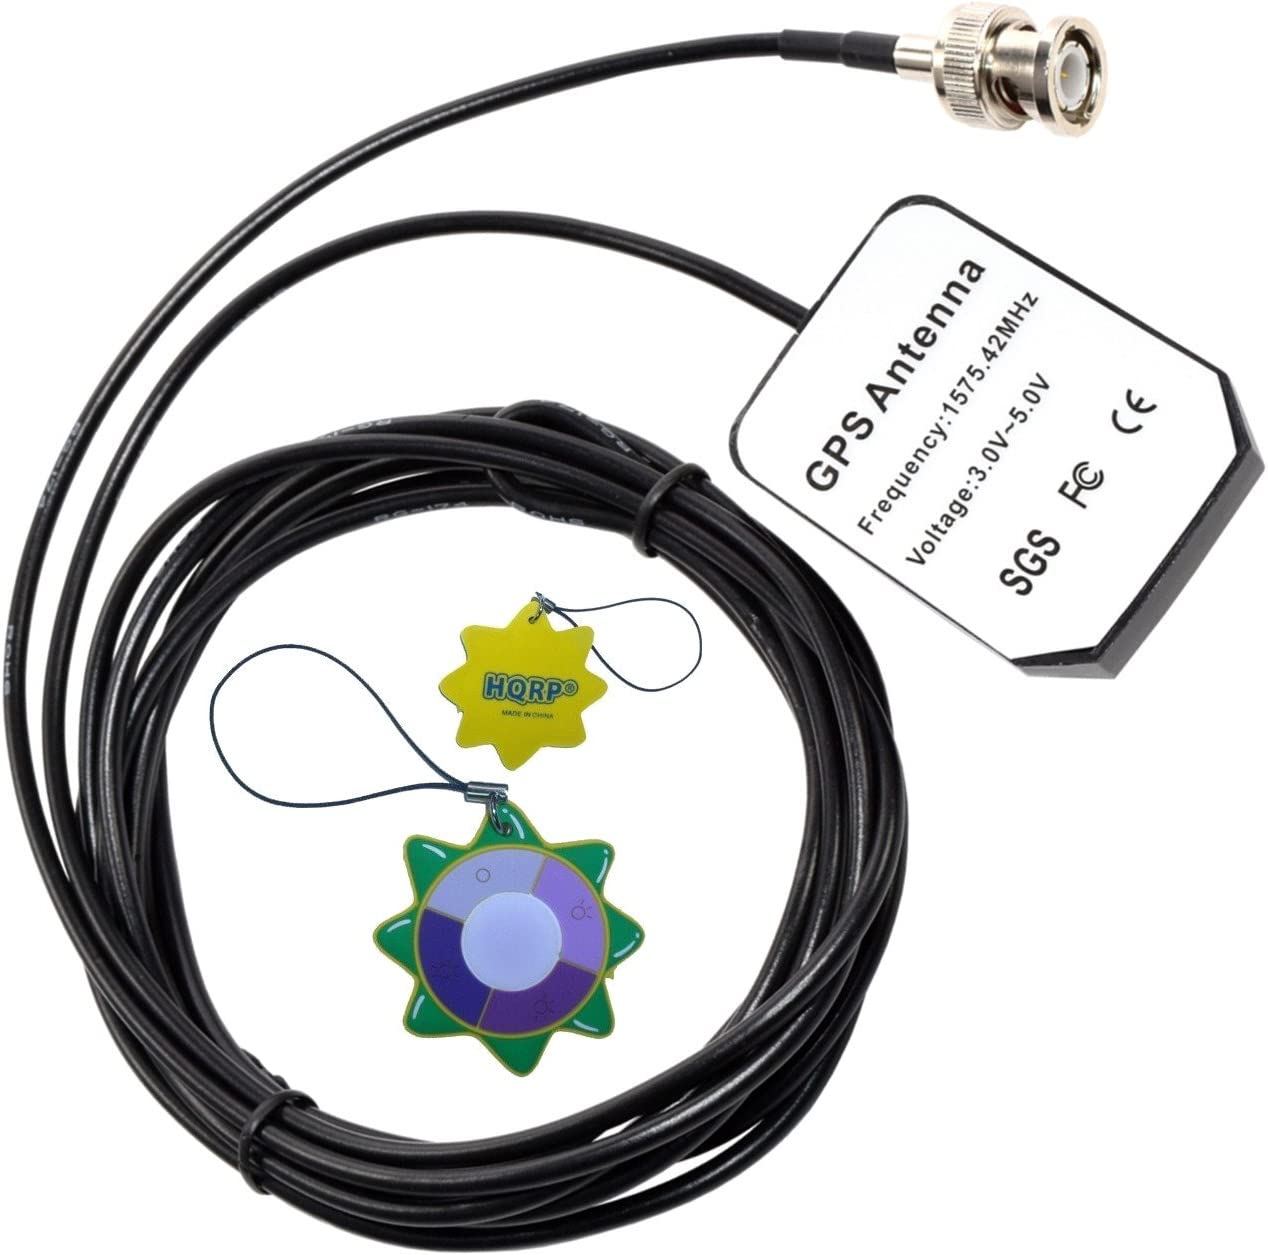 HQRP antena externa GPS para Garmin GPSMAP 545S / 546 / 546s / 550S / 555S / 720 / 720s / StreetPilot III GPS + HQRP medidor del sol